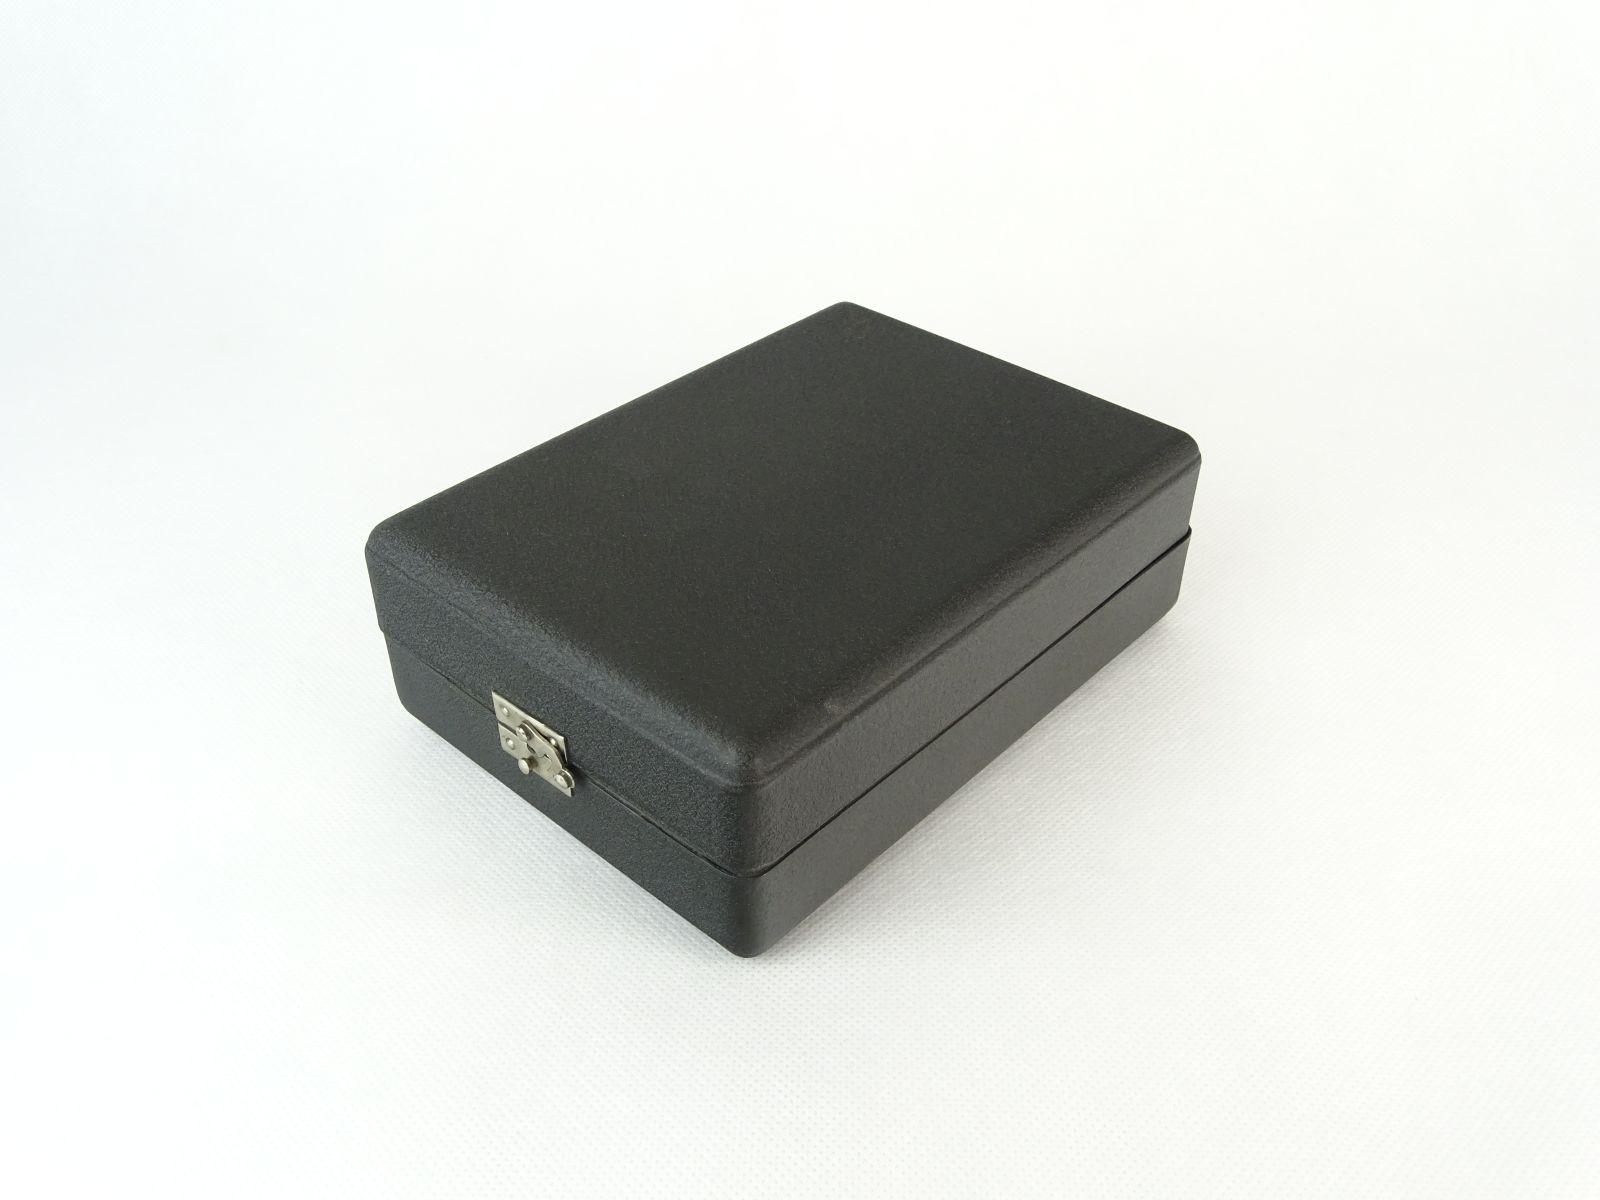 DSC02831.JPG (1600×1200)